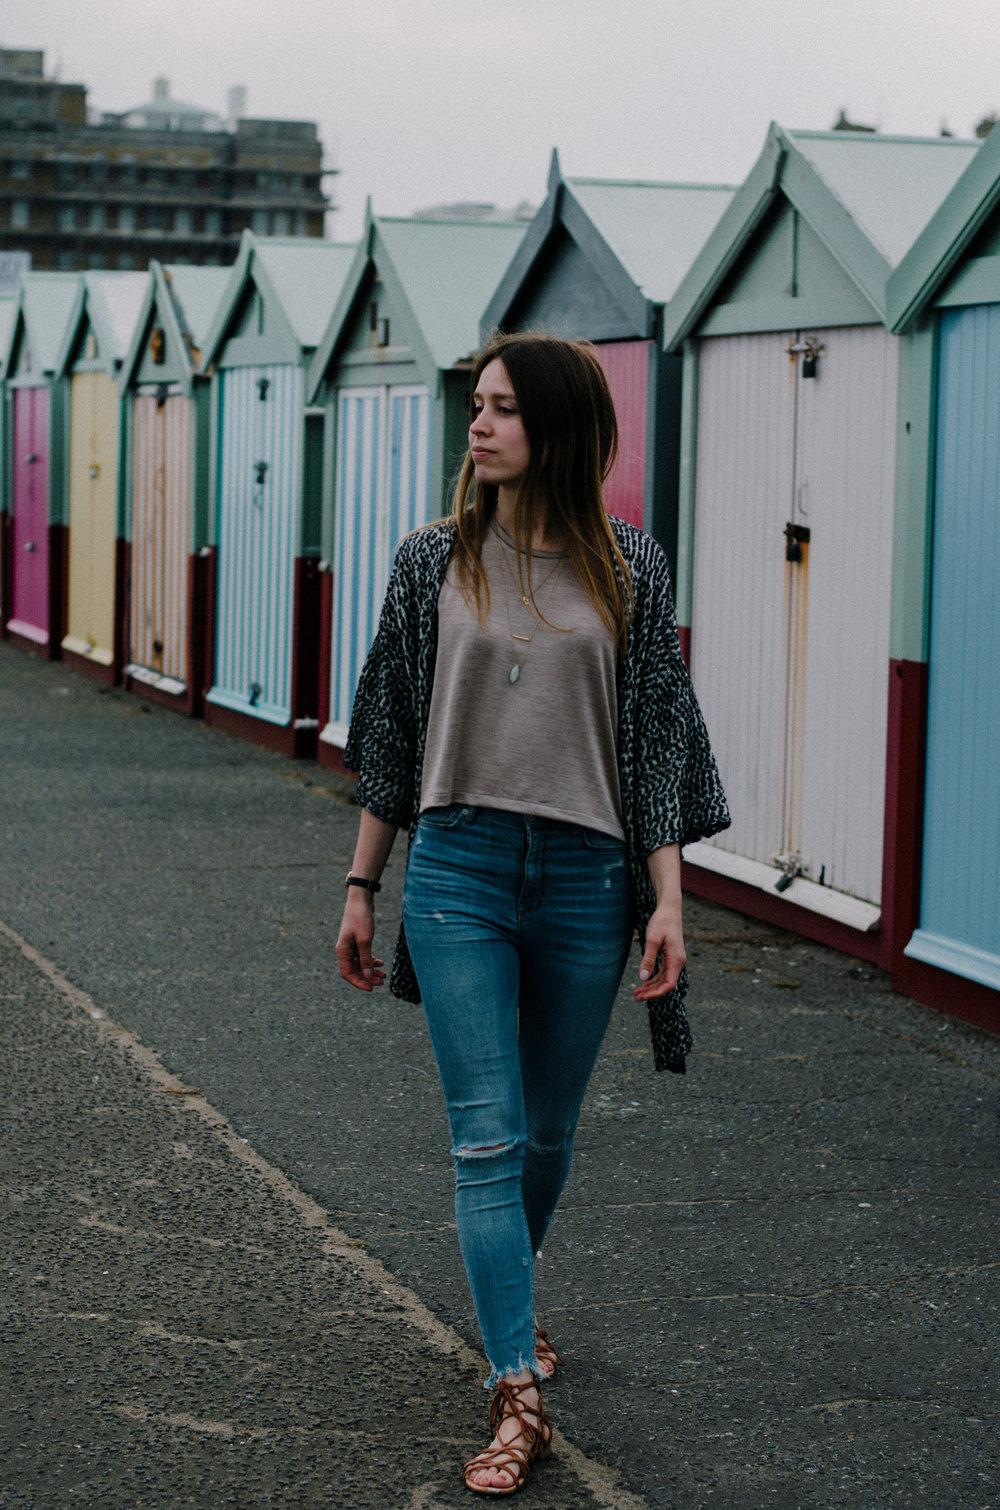 Lina - Portraits in Brighton - Aiste Saulyte Photography-4.jpg